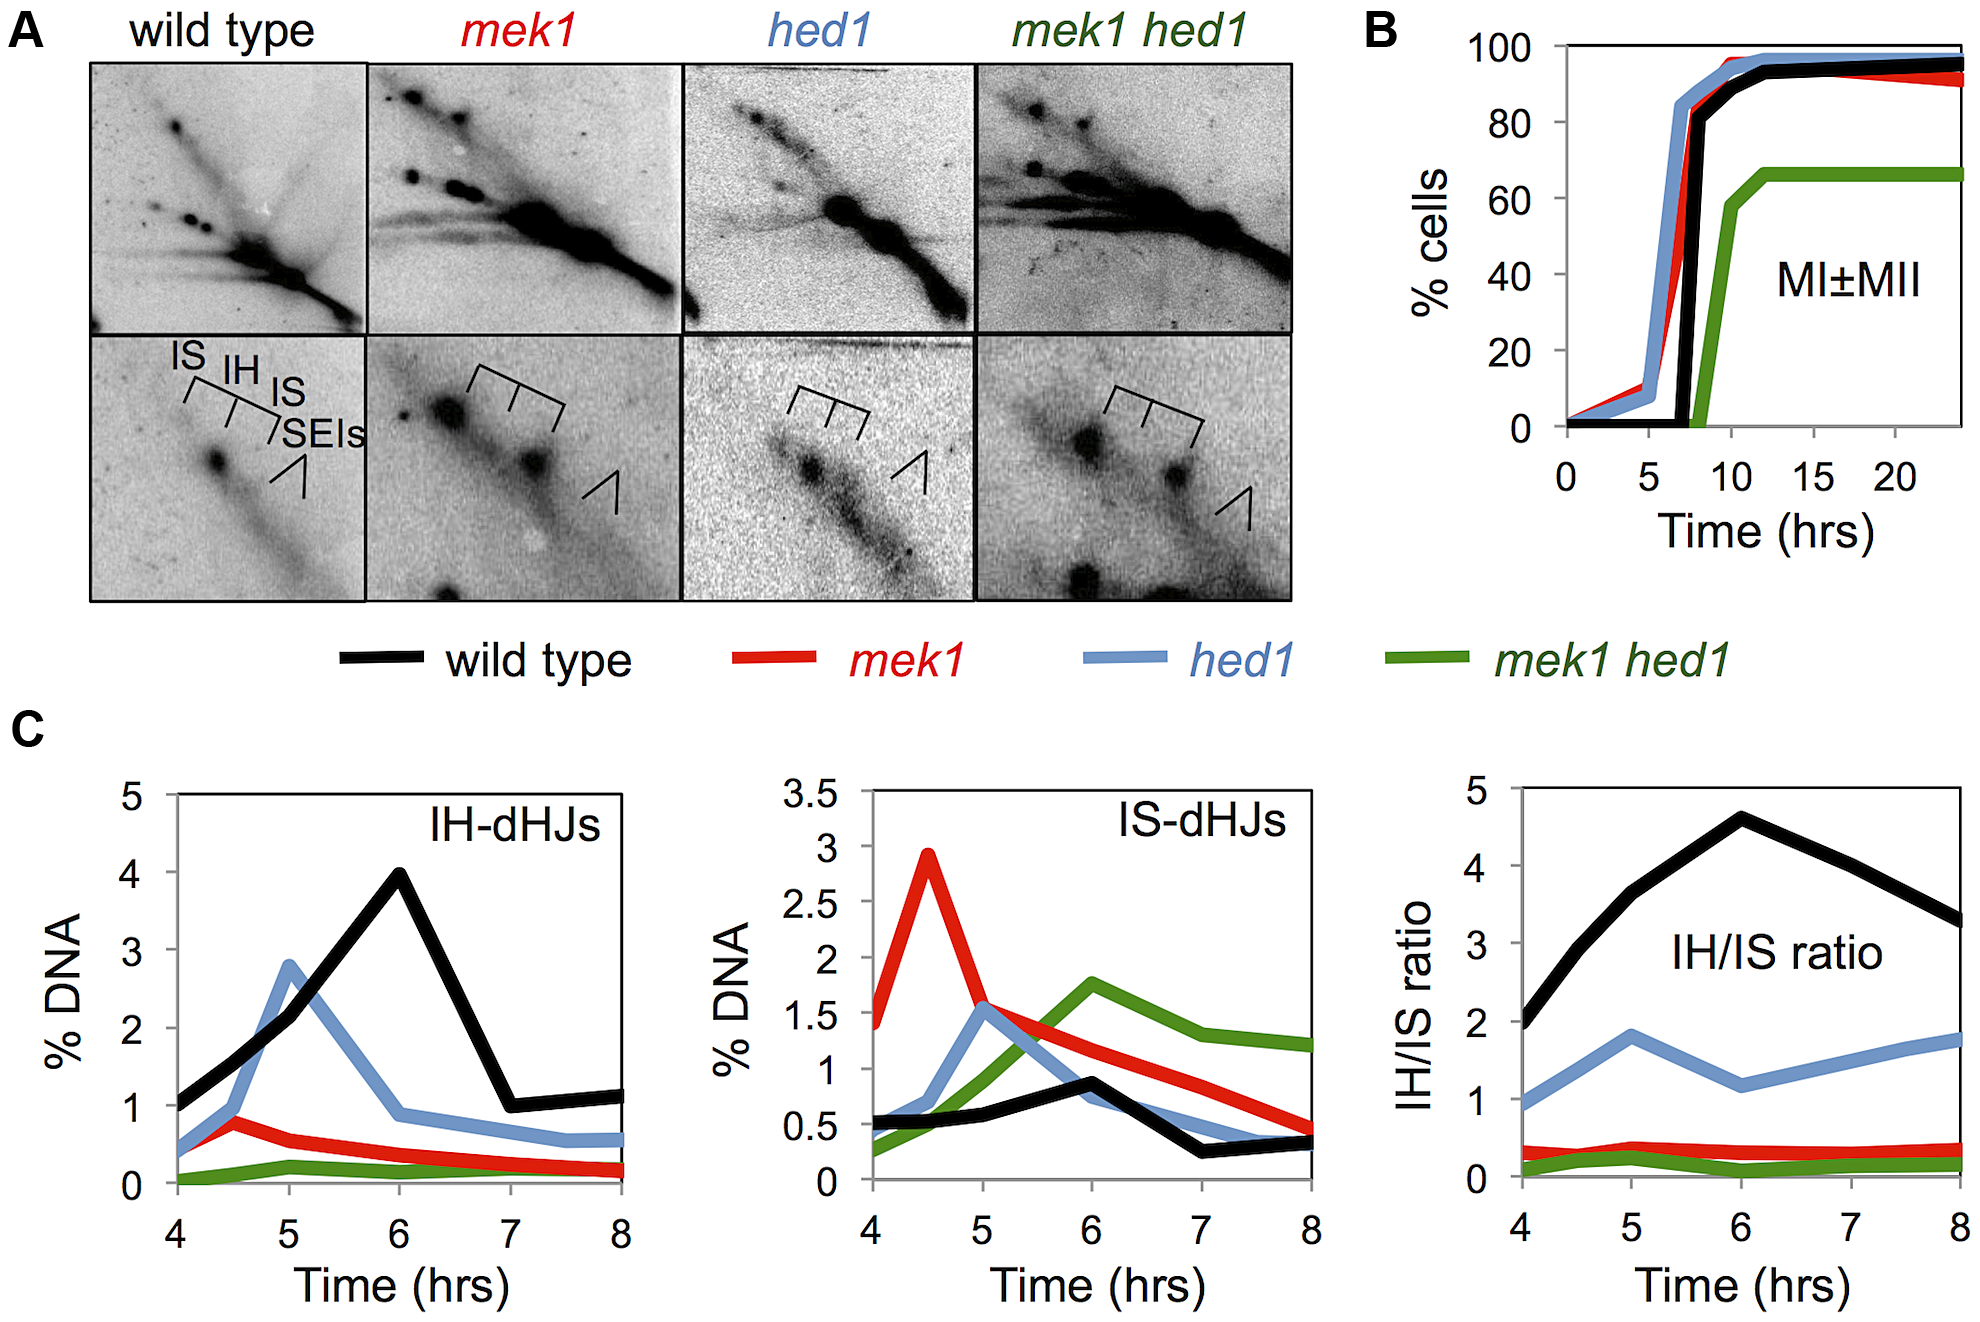 Mek1 and Hed1 make independent contributions to interhomolog template bias.